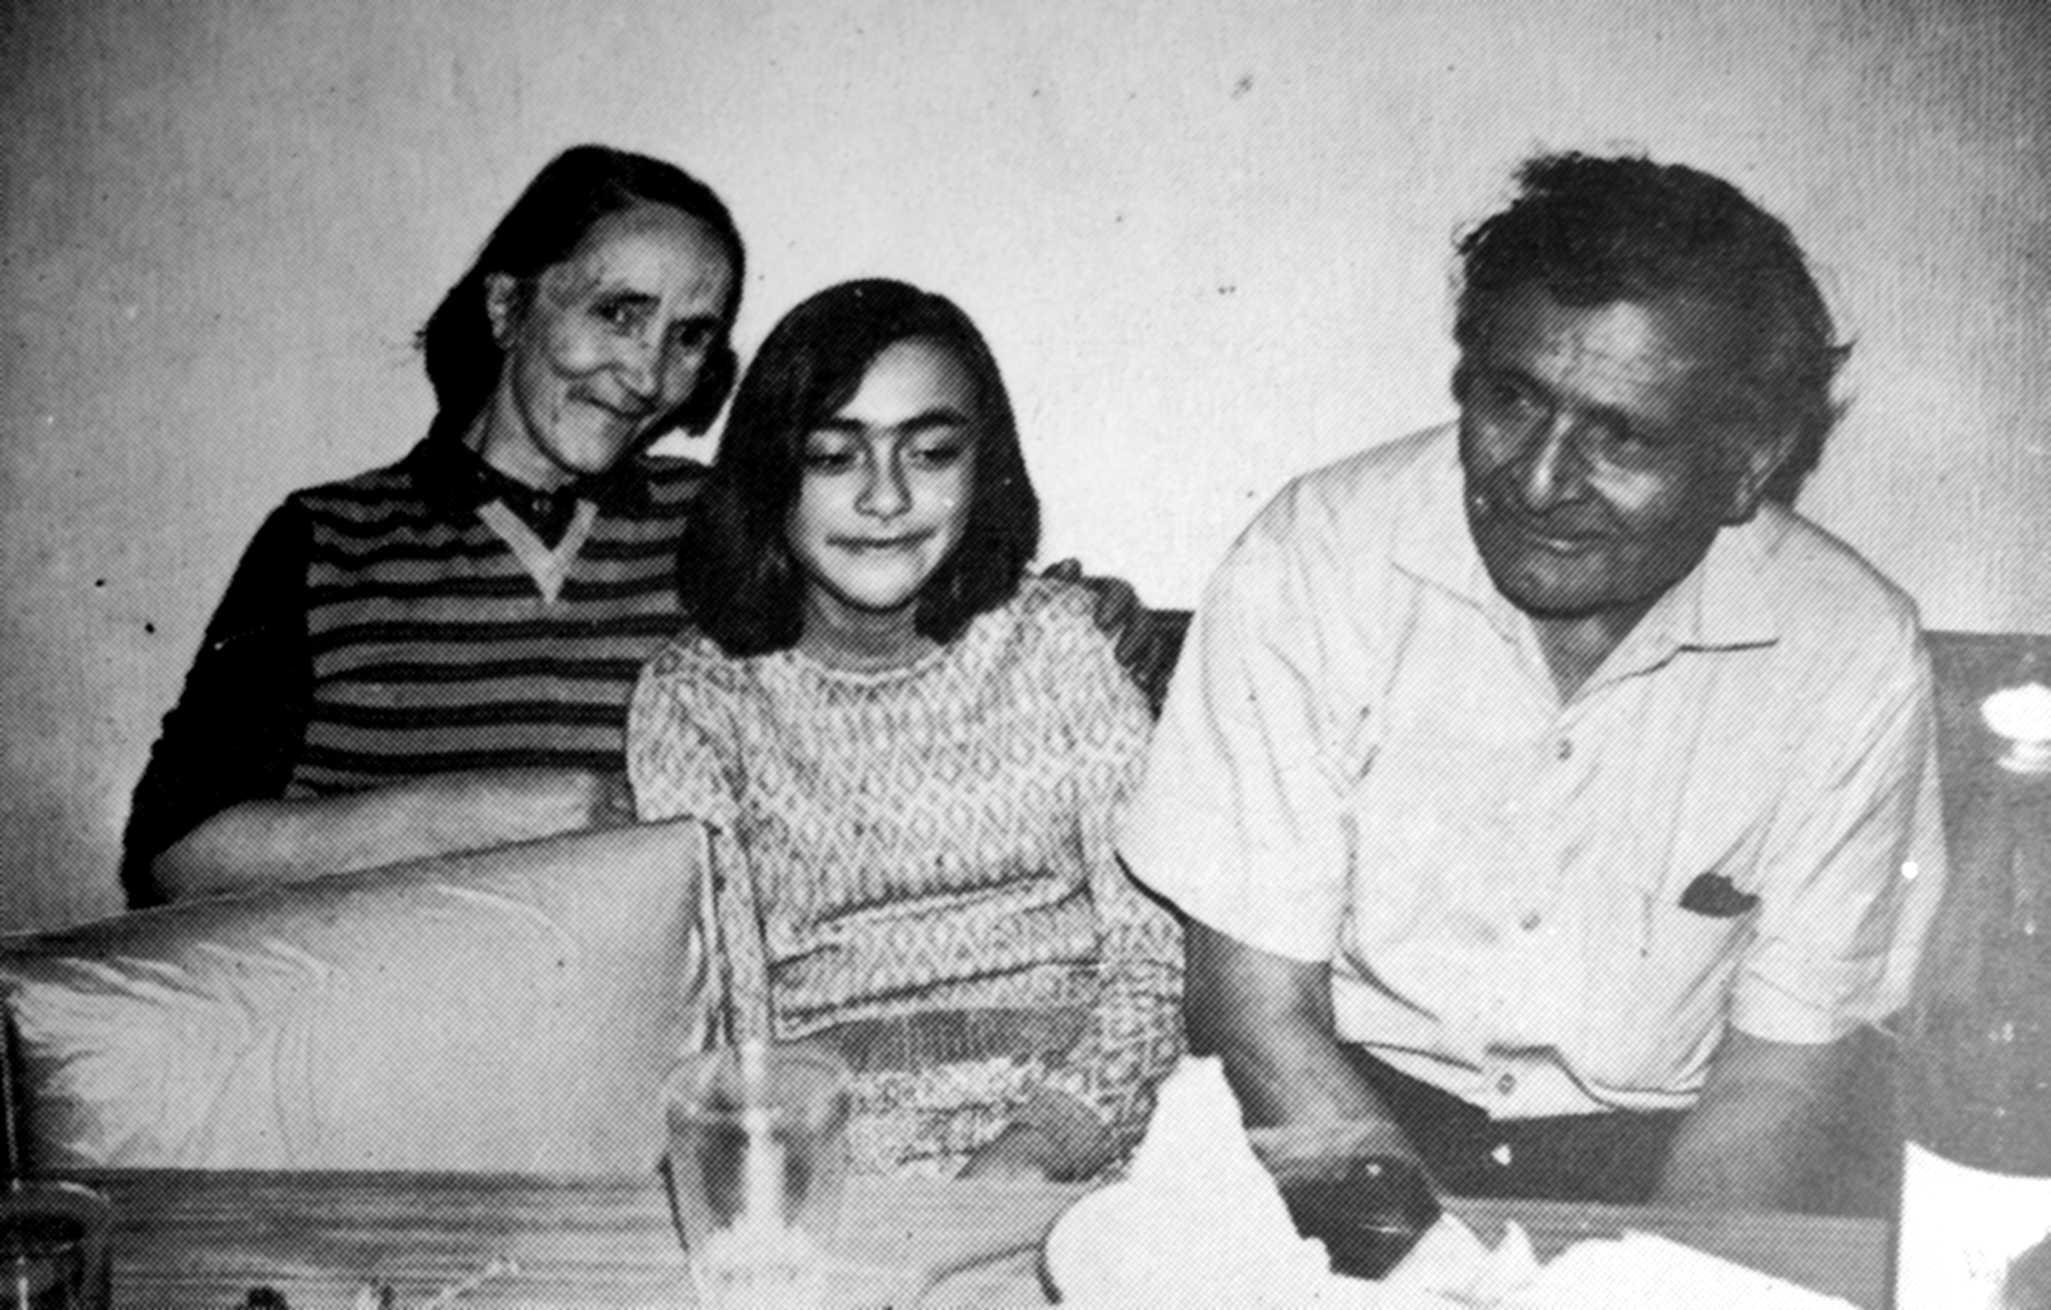 Ángel Borda amb sa companya Libertad i sa filla (1975)